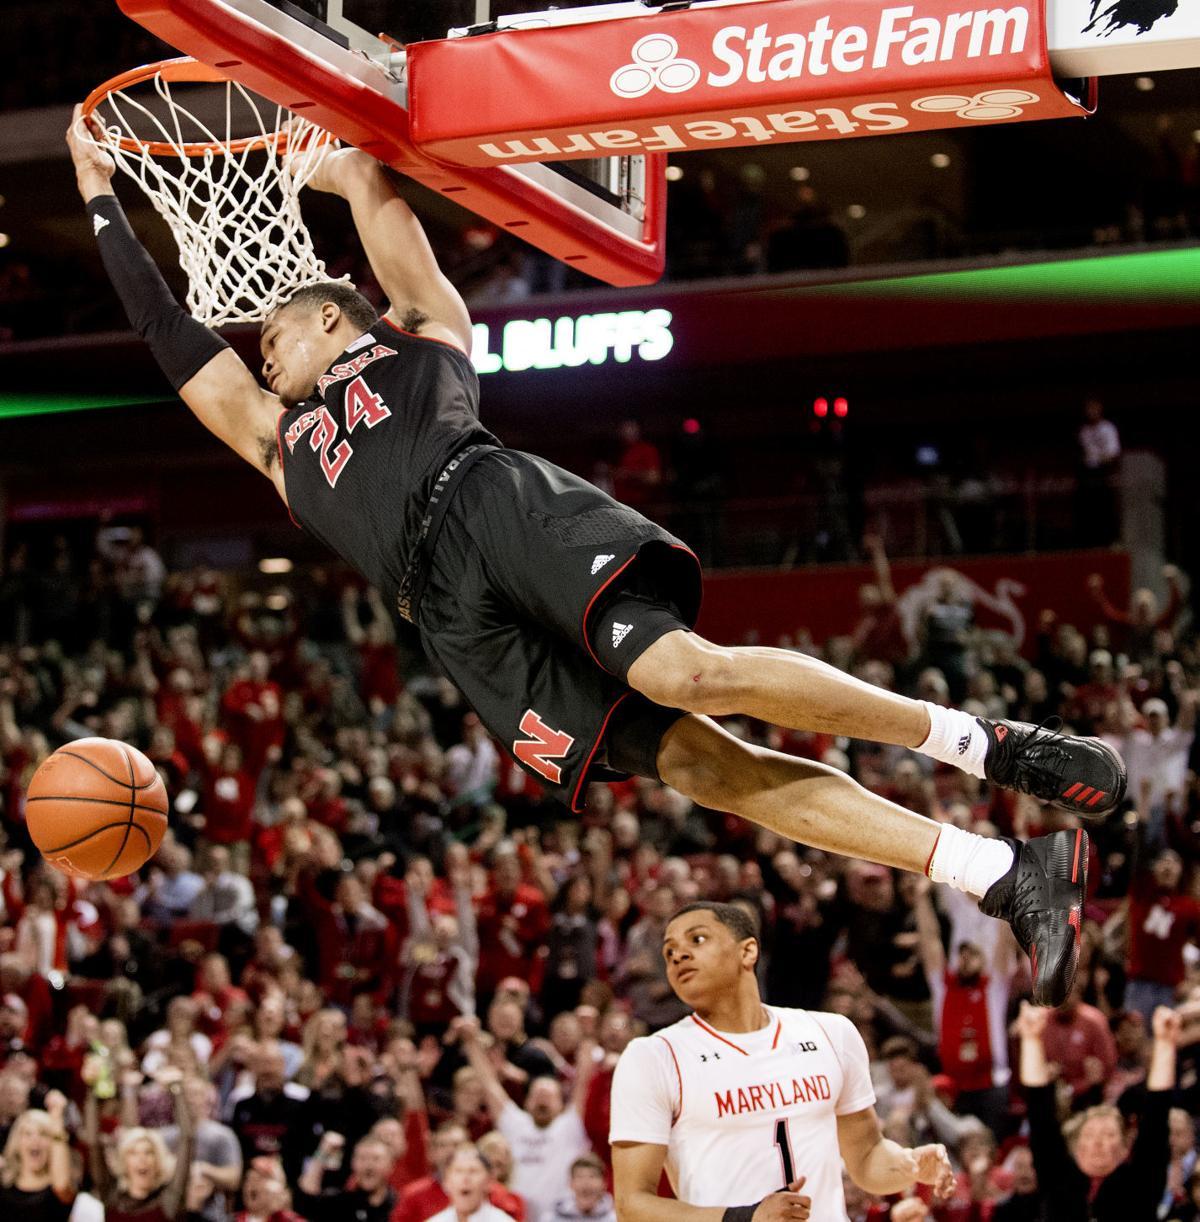 James Palmer dunks against Maryland